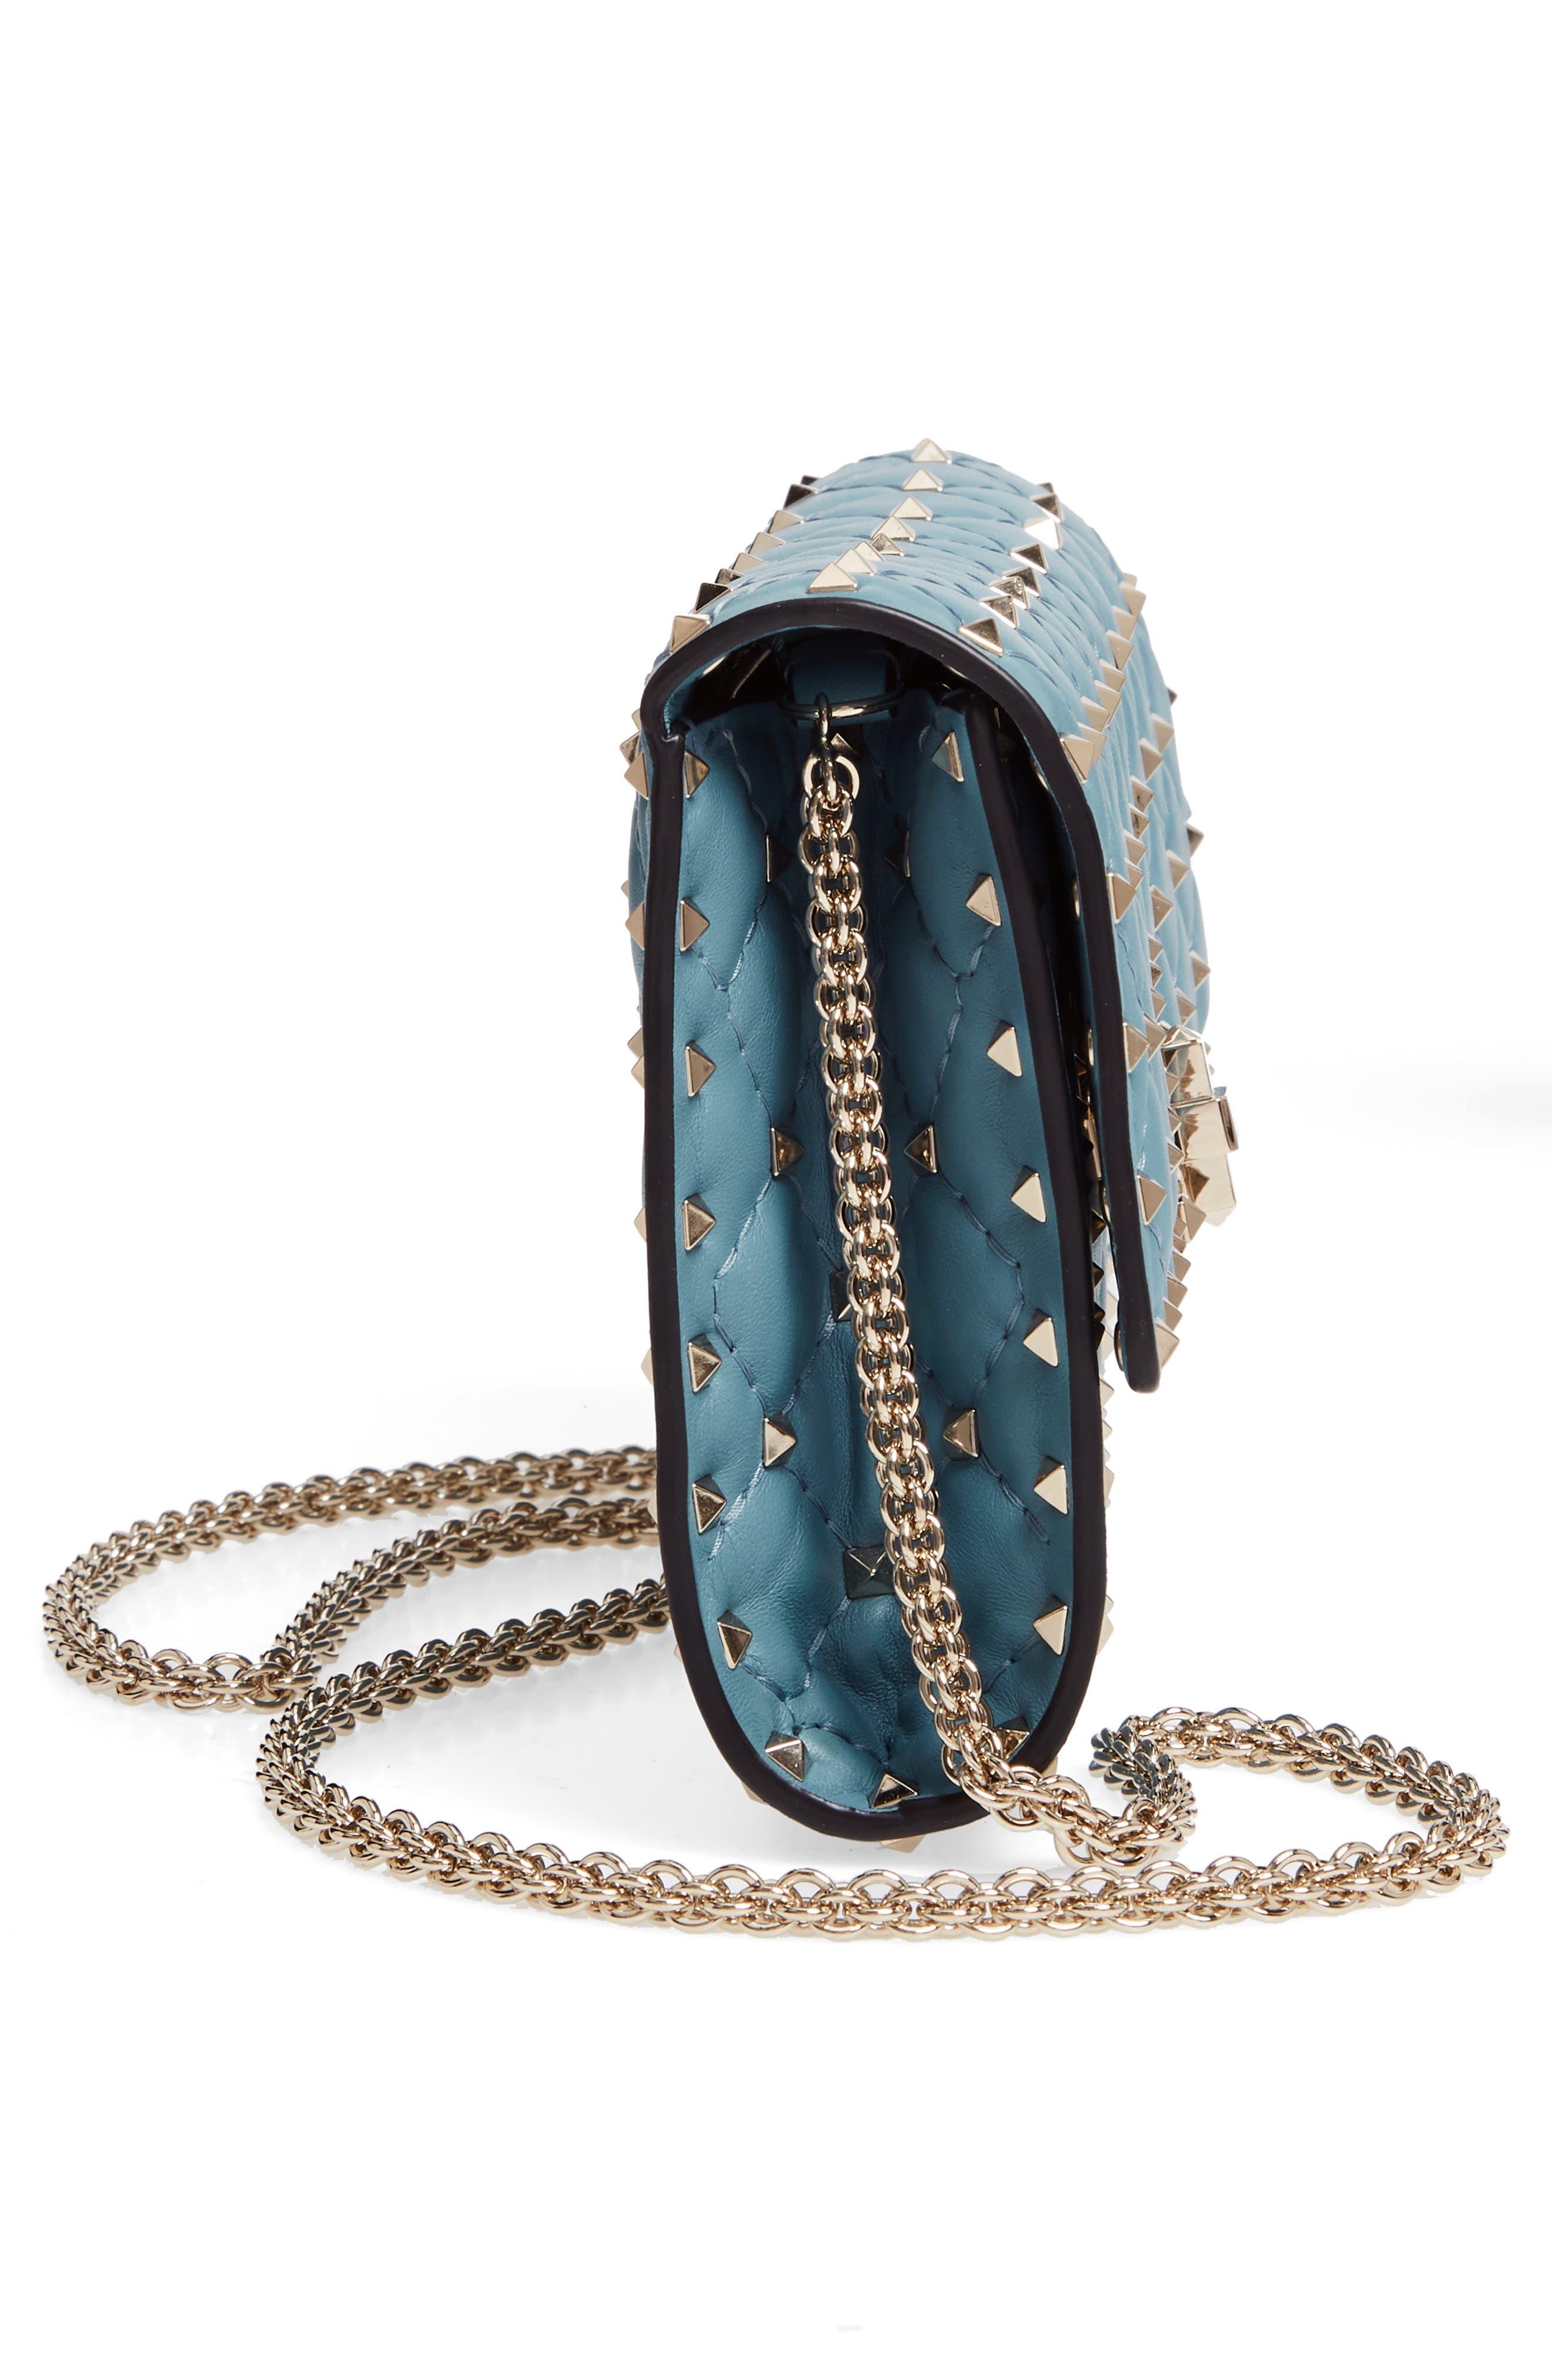 VALENTINO GARAVANI, Rockstud Matelassé Quilted Leather Crossbody Bag, Alternate thumbnail 5, color, ATLANTIQUE